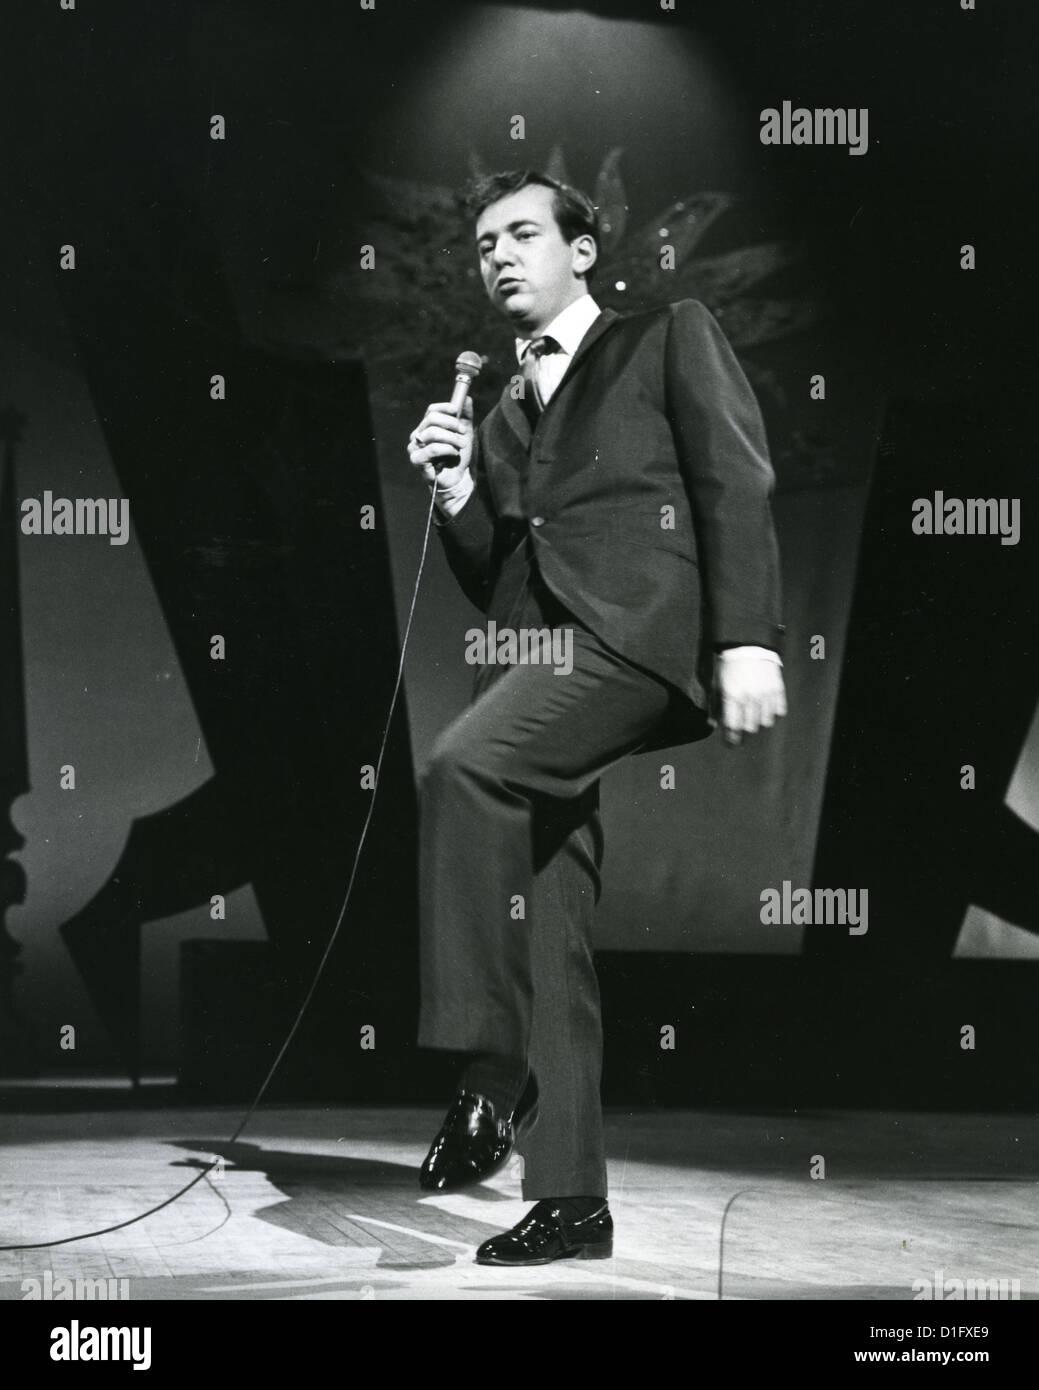 BOBBY DARIN (1936-1973) US singer and film actor in 1959. Photo Harry Hammond - Stock Image